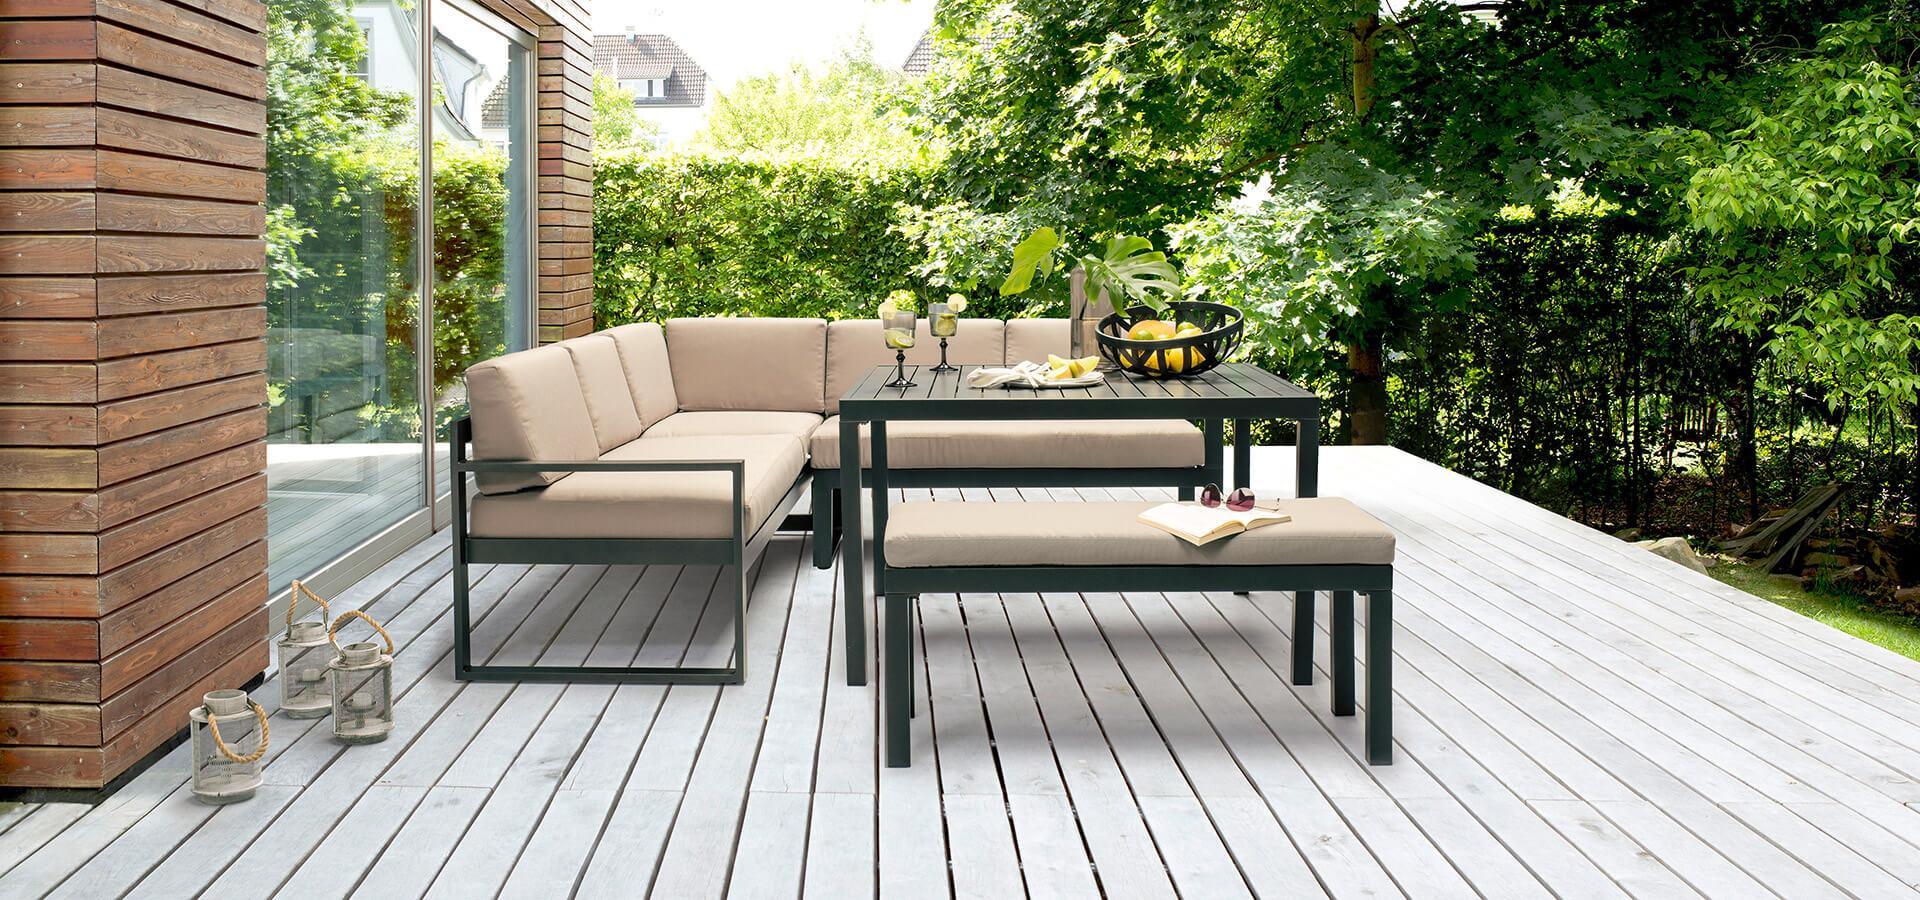 Modern Balkon Lounge Möbel